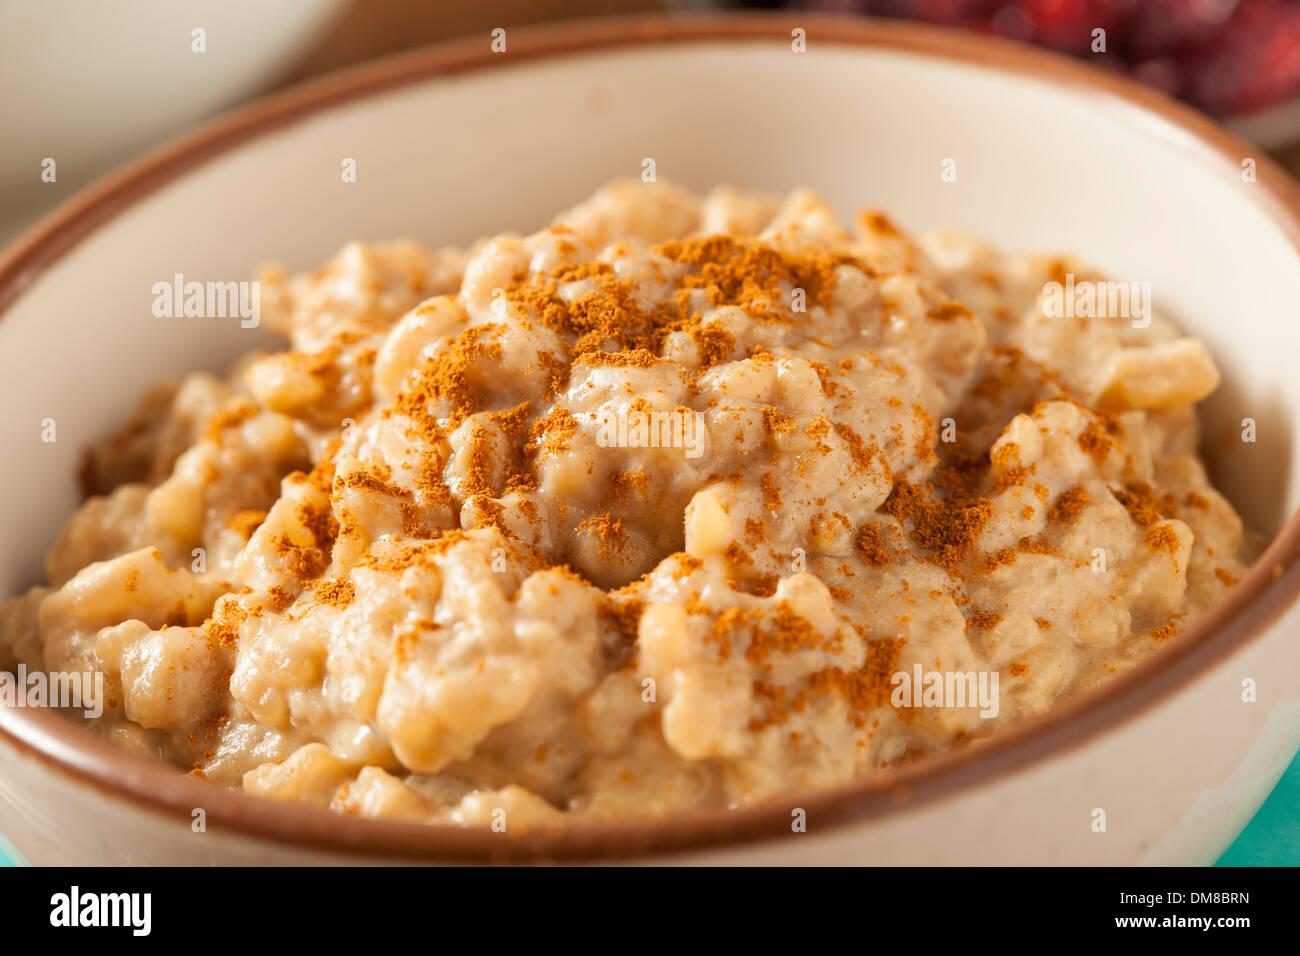 Homemade Healthy Rice Pudding with Brown Cinnamon - Stock Image